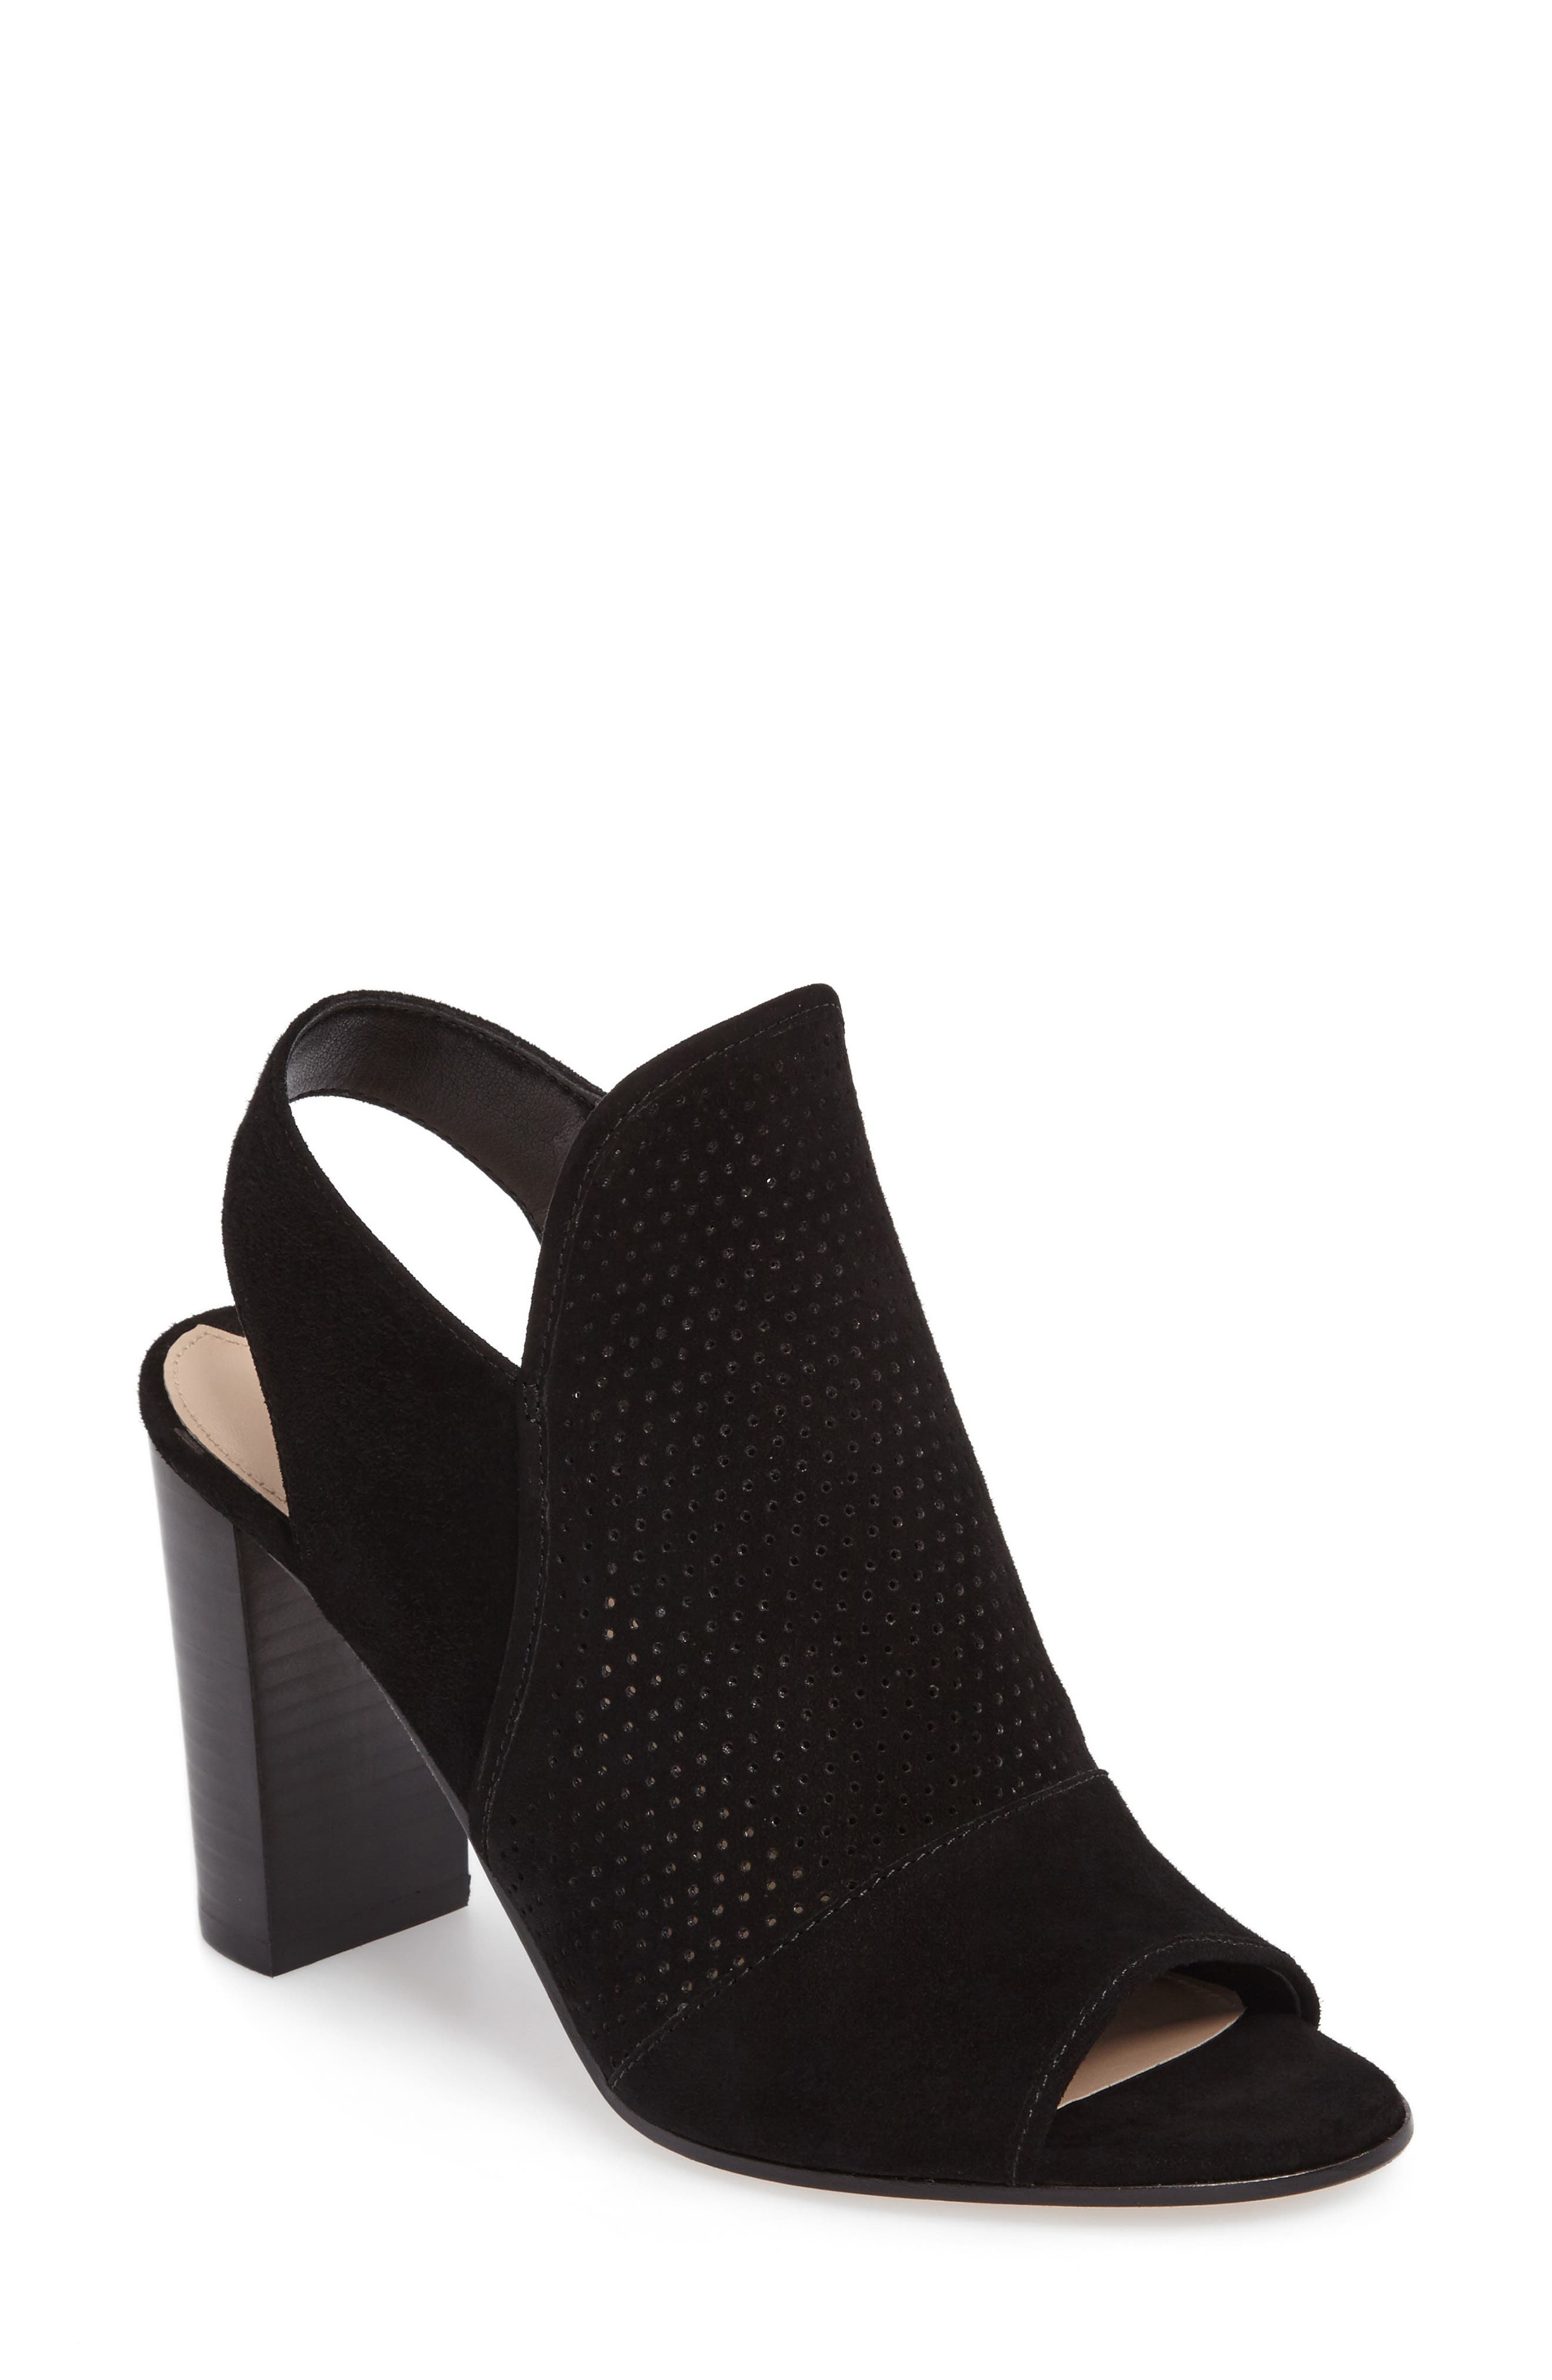 Gaze Block Heel Sandal,                         Main,                         color, 001